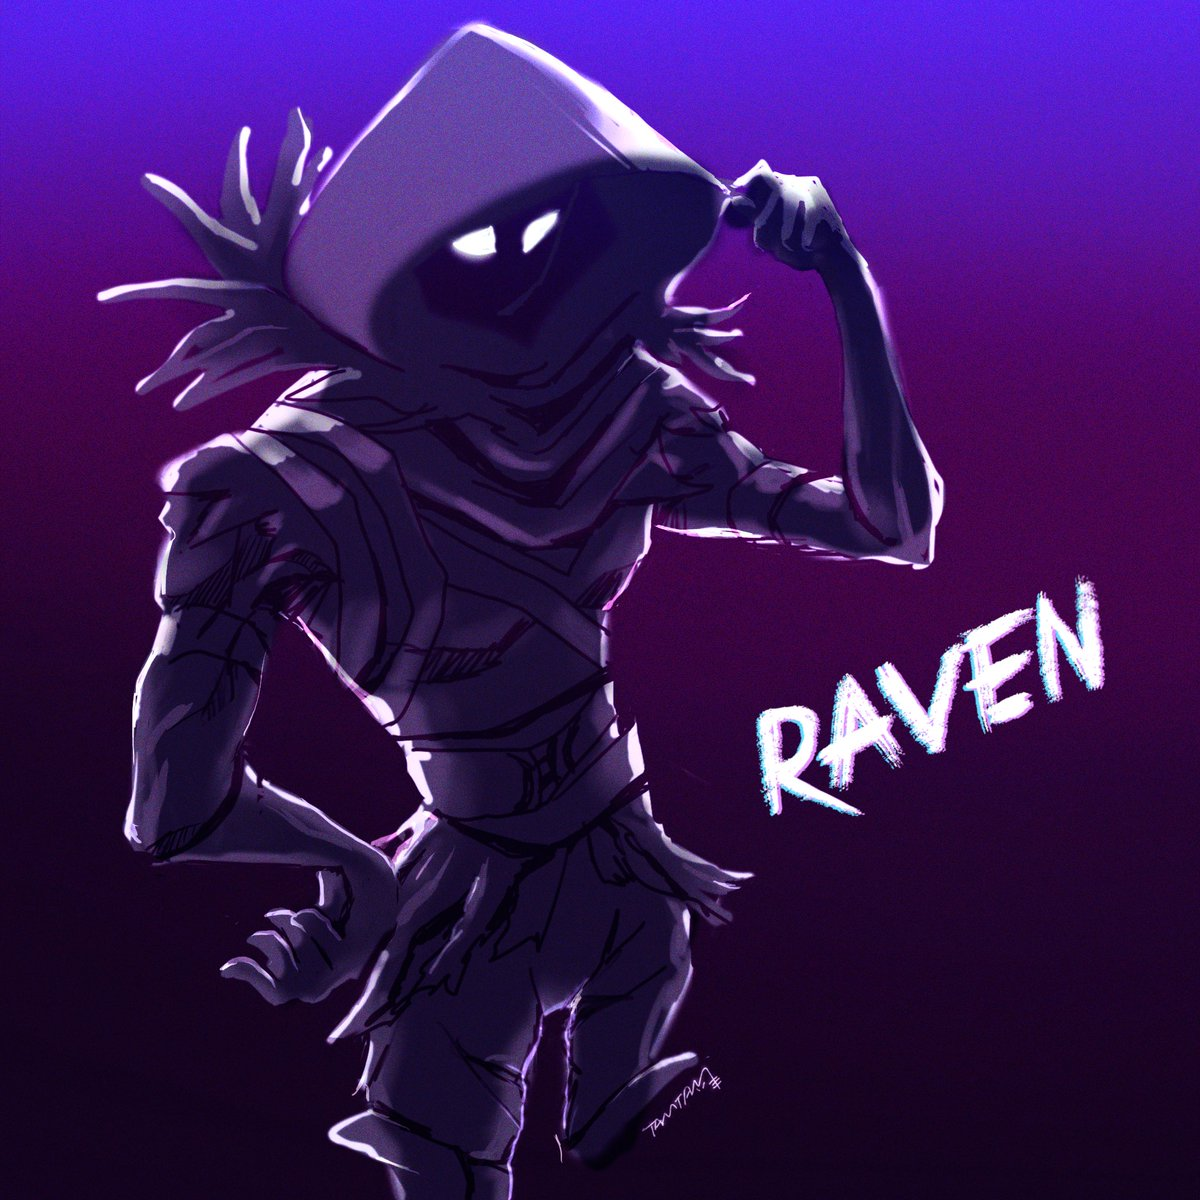 Raven レイヴン ワンドロ フリーアイコン Free Icon Fortniteart